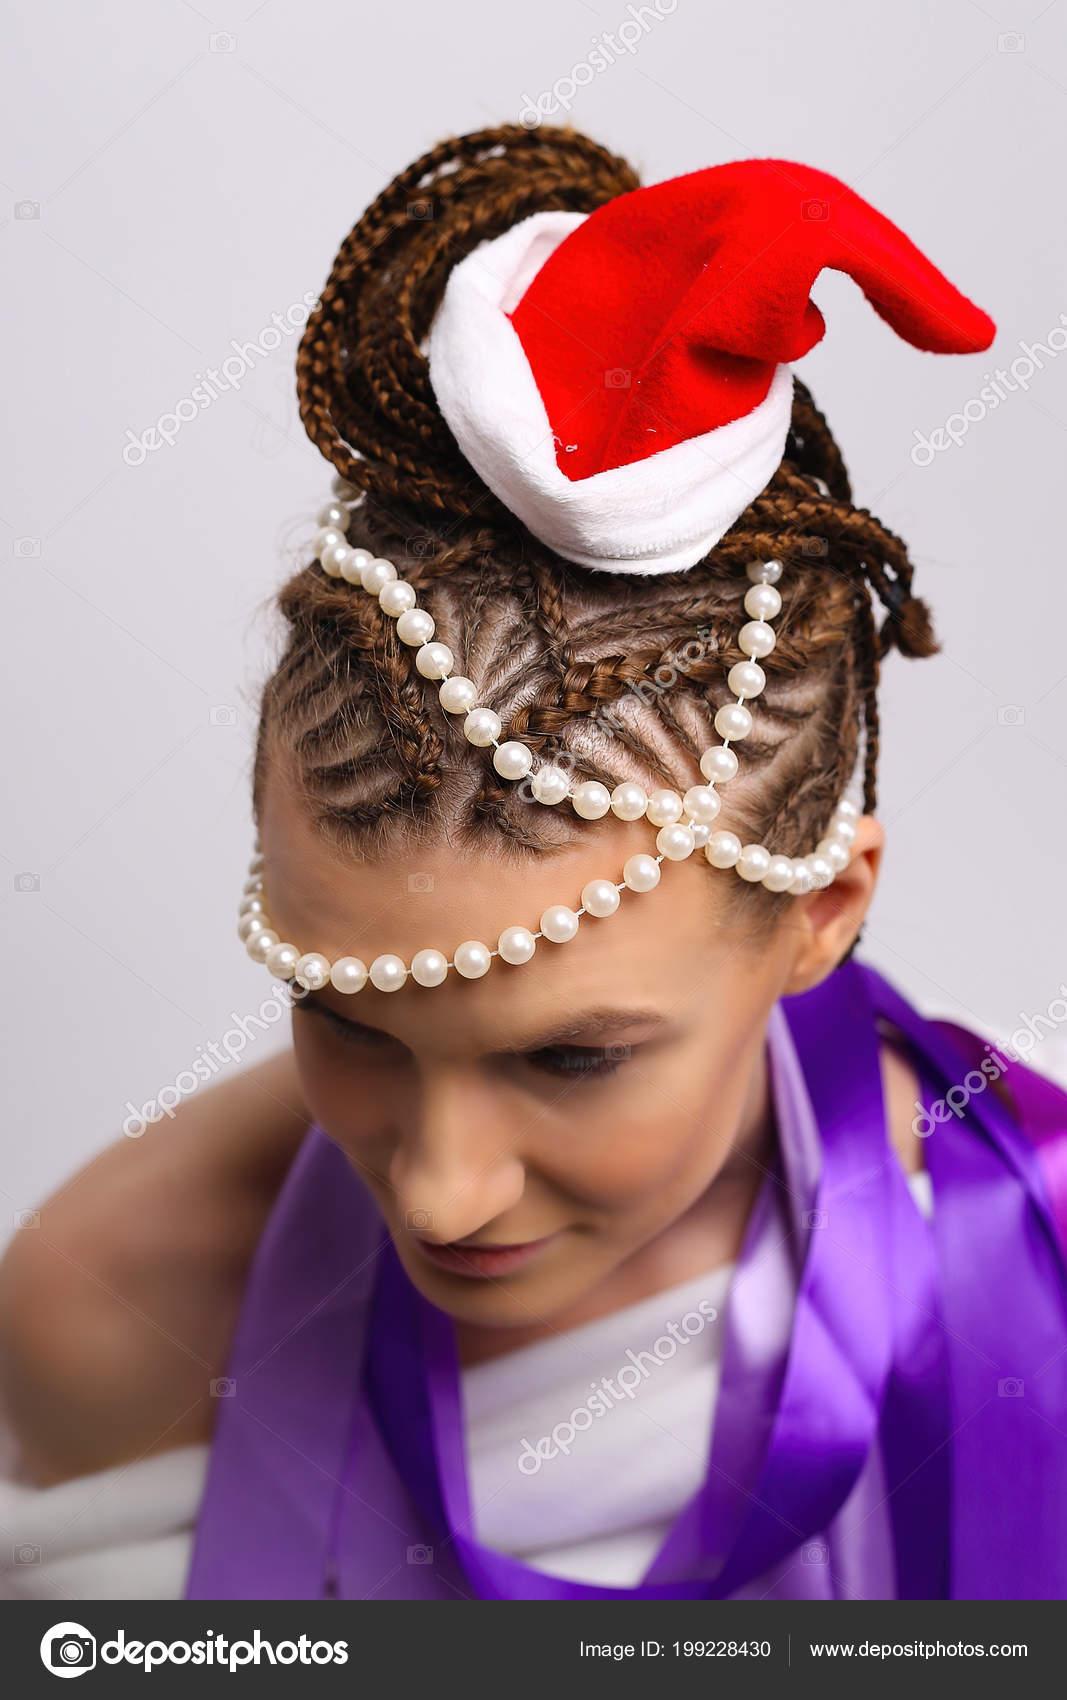 Brading New Year Harpoon Hairstyle New Year Attire Stock Photo